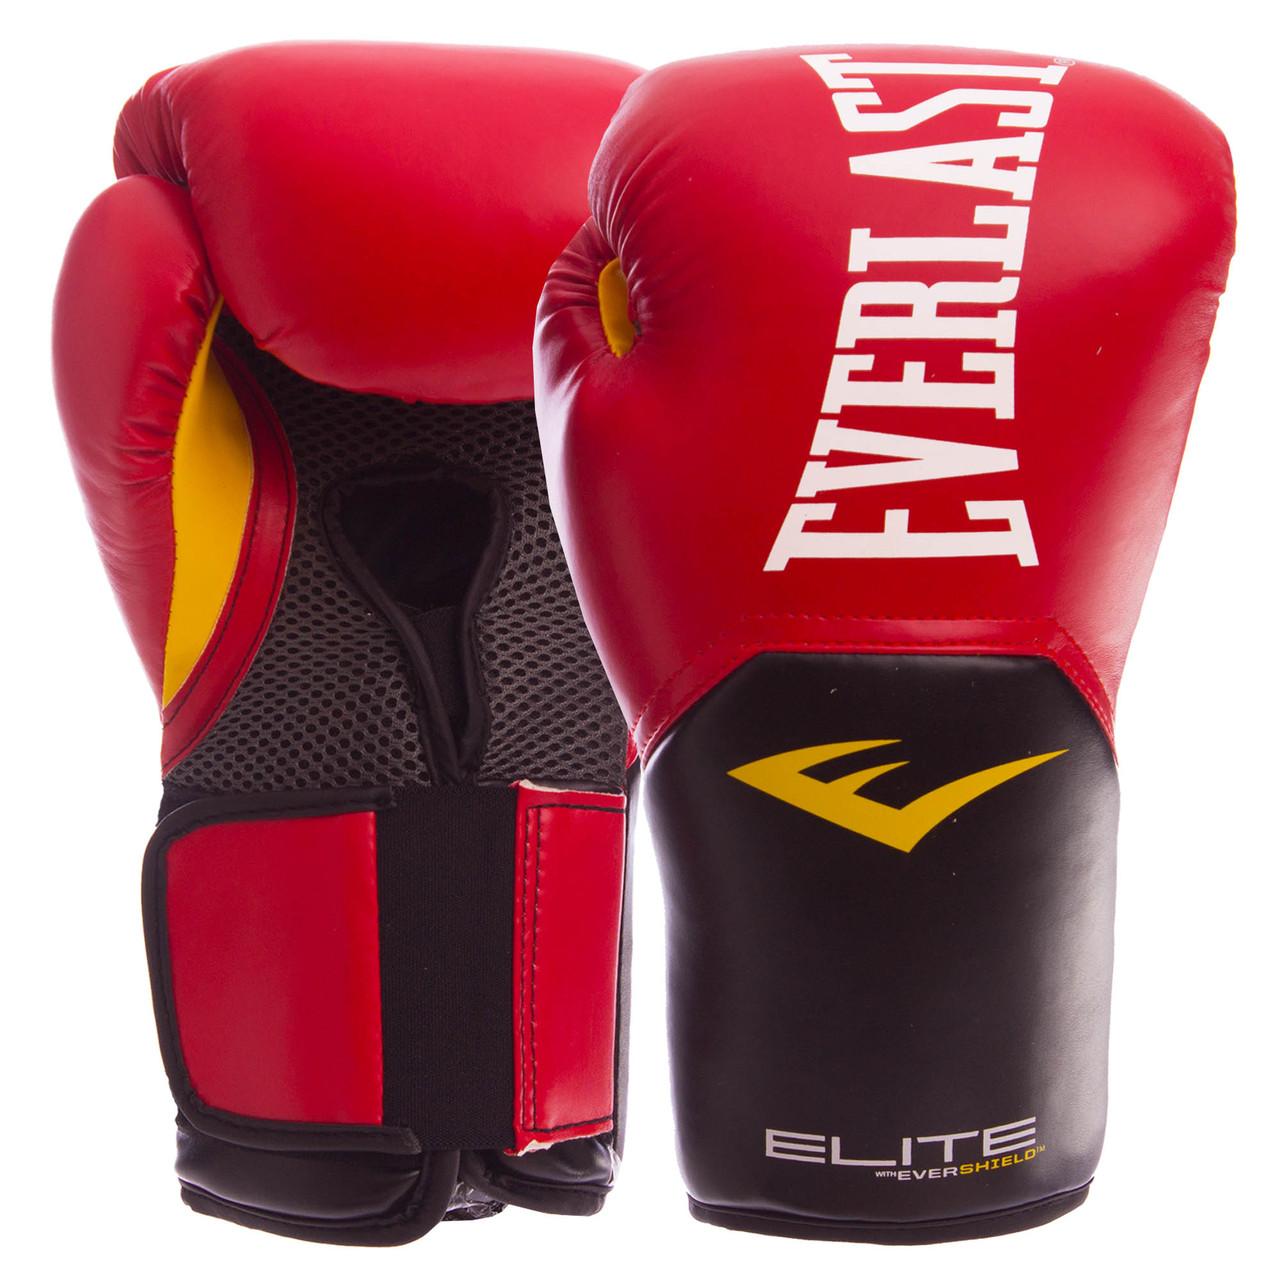 Перчатки боксерские PU на липучке EVERLAST P00001243 PRO STYLE ELITE (р-р 12oz, красный)